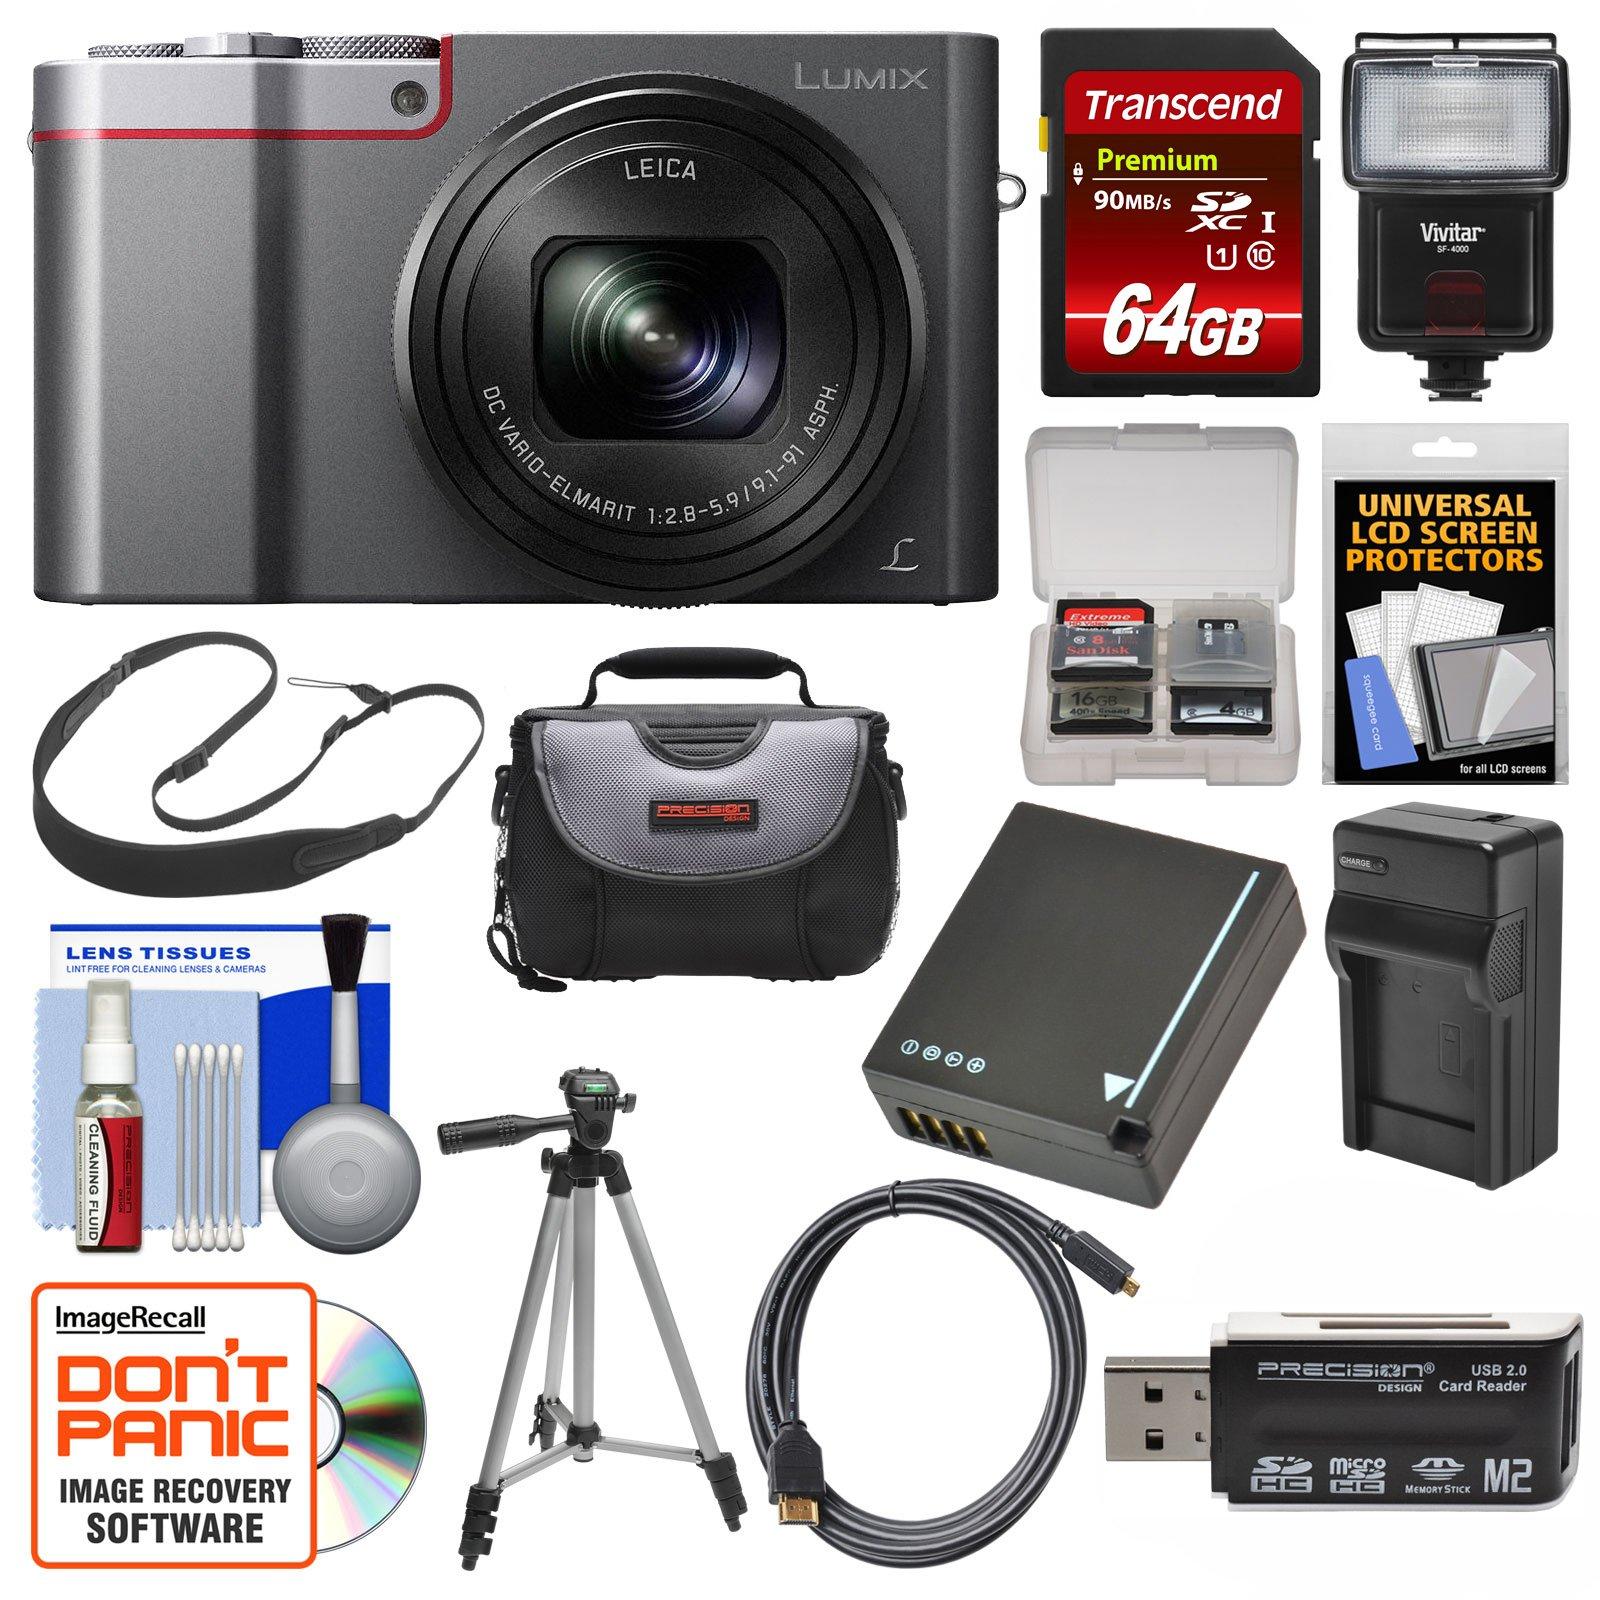 Panasonic Lumix DMC-ZS100 4K Wi-Fi Digital Camera (Silver) with 64GB Card + Case + Flash + Battery & Charger + Tripod + Strap + Kit